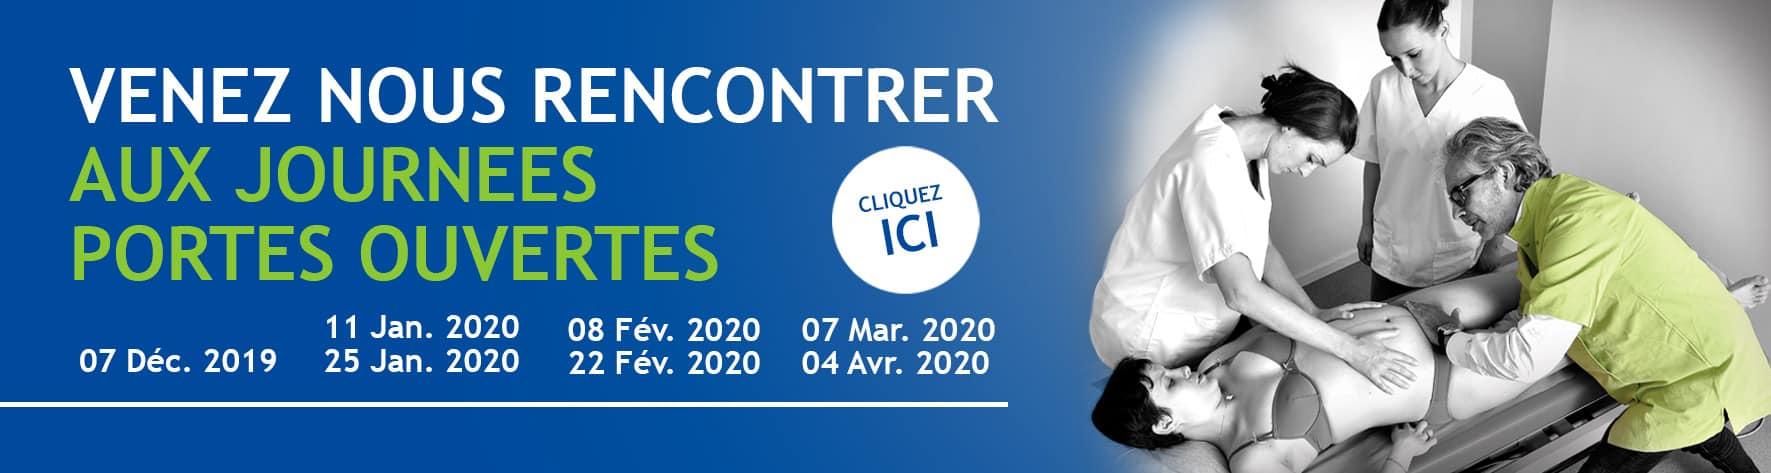 Bandeau-JPO-2019